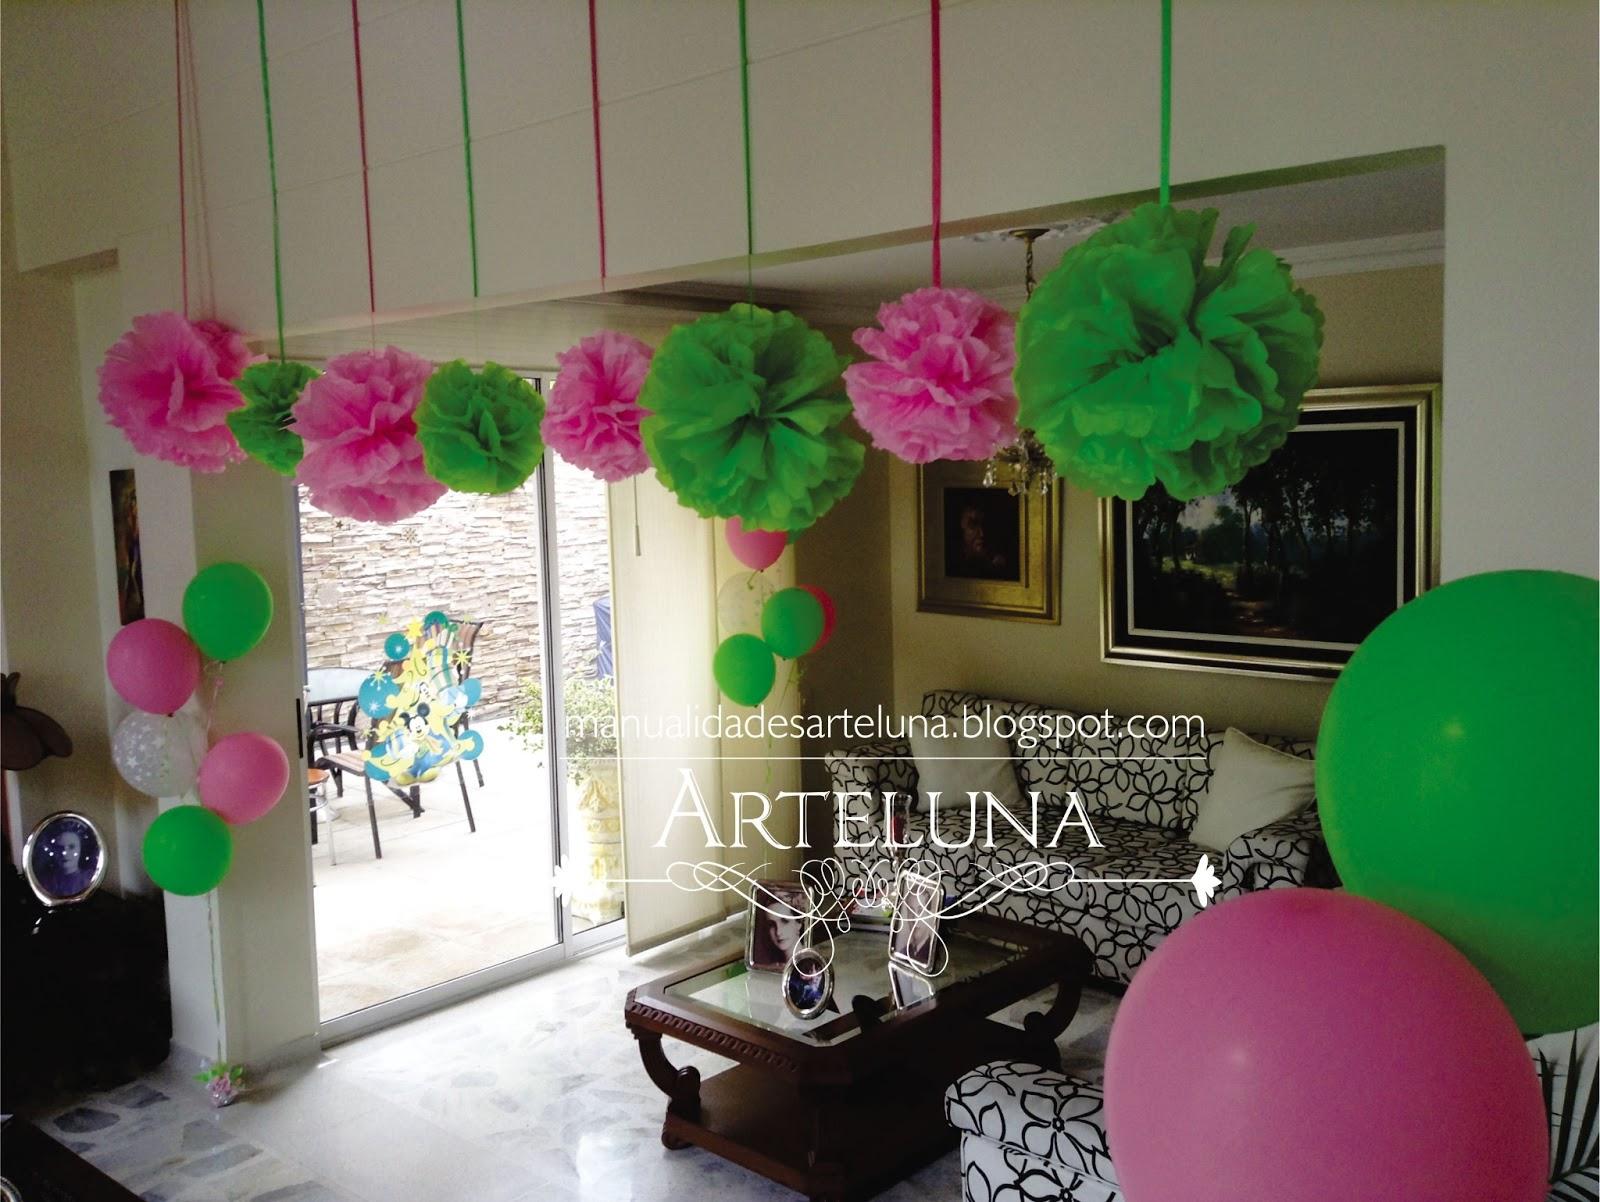 Arte luna decoracion baby shower - Decoracion baby shower ...